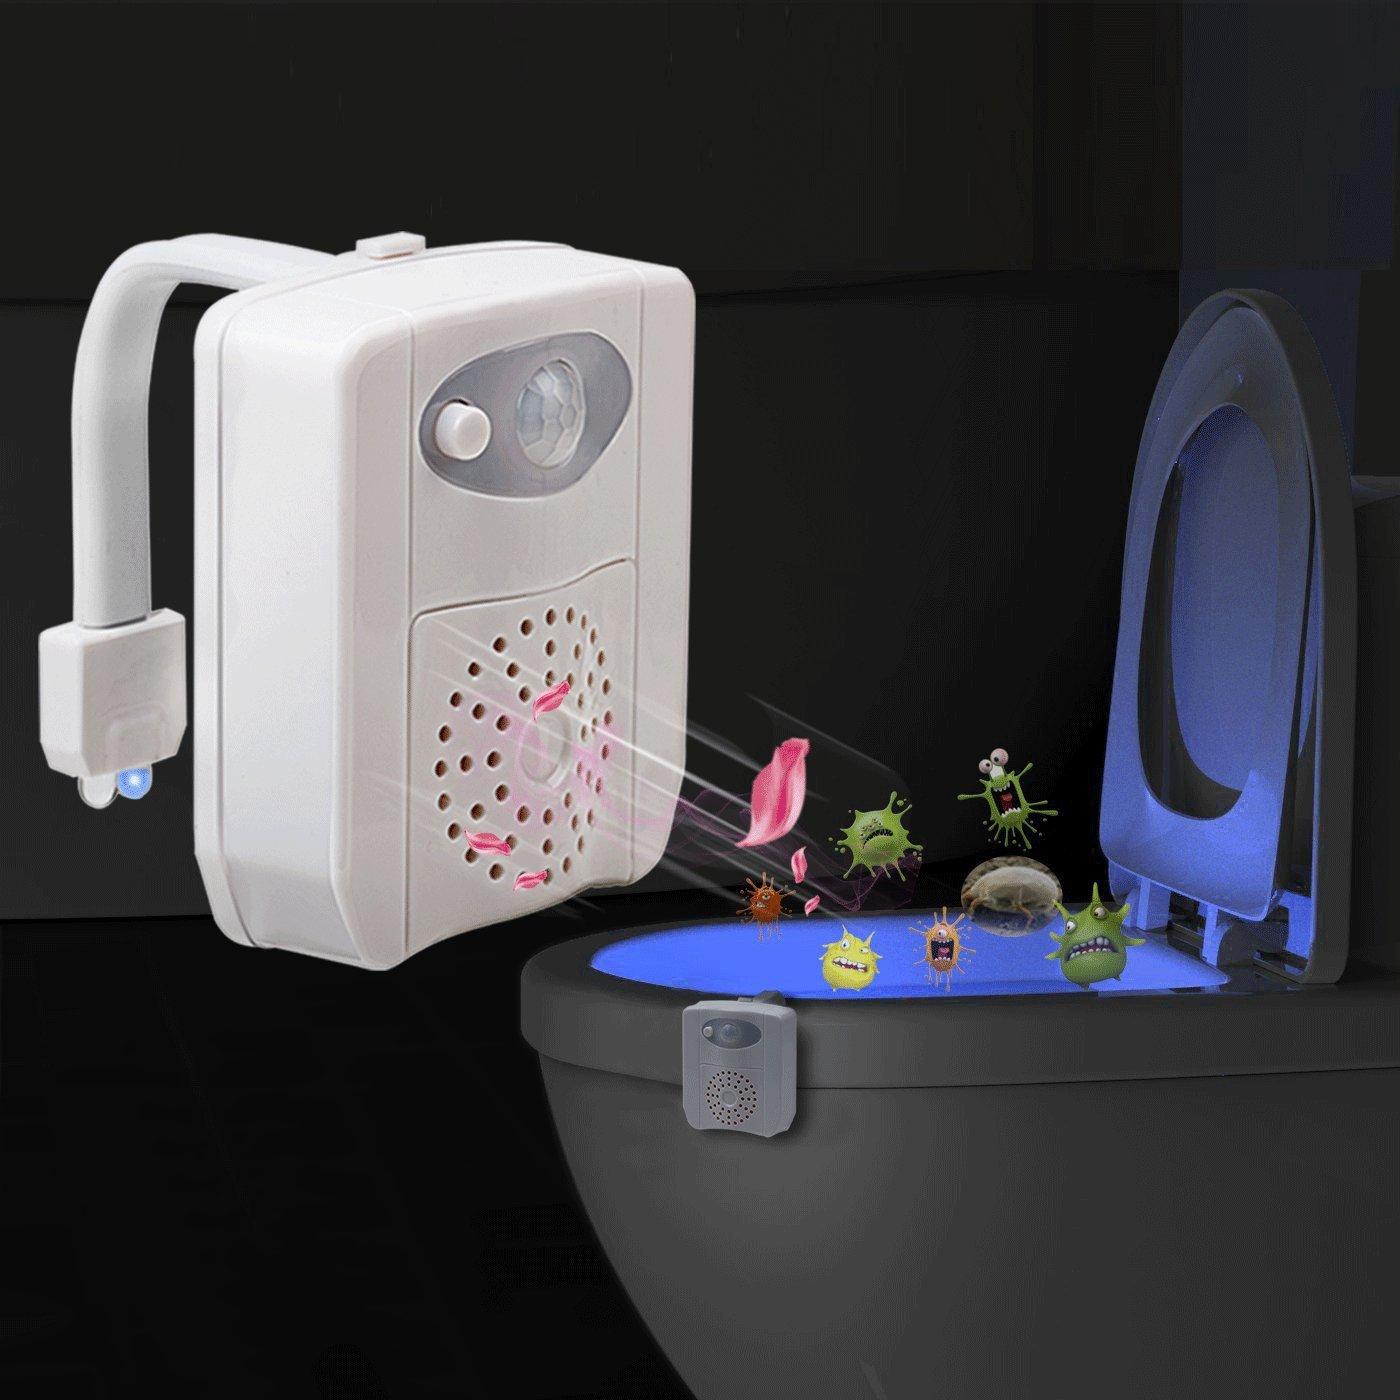 XHL-Oumin Motion Sensor Toilet Night Light - 16-Color LED Bowel Night - Waterproof, Light Detection, Toilet Glow Light for Bathroom